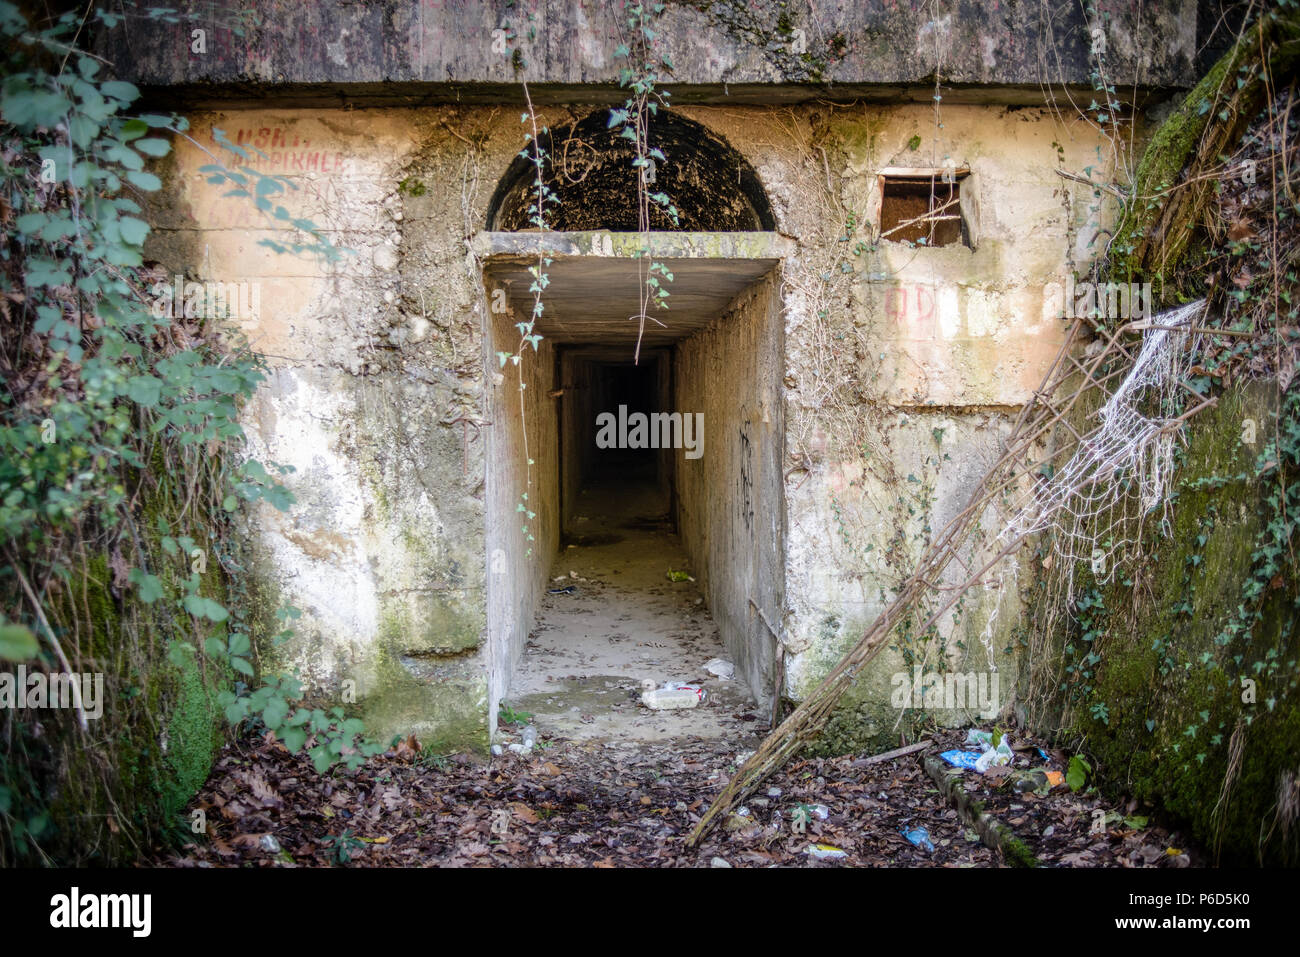 Entrance to the bunker, Tirana, Albania - Stock Image